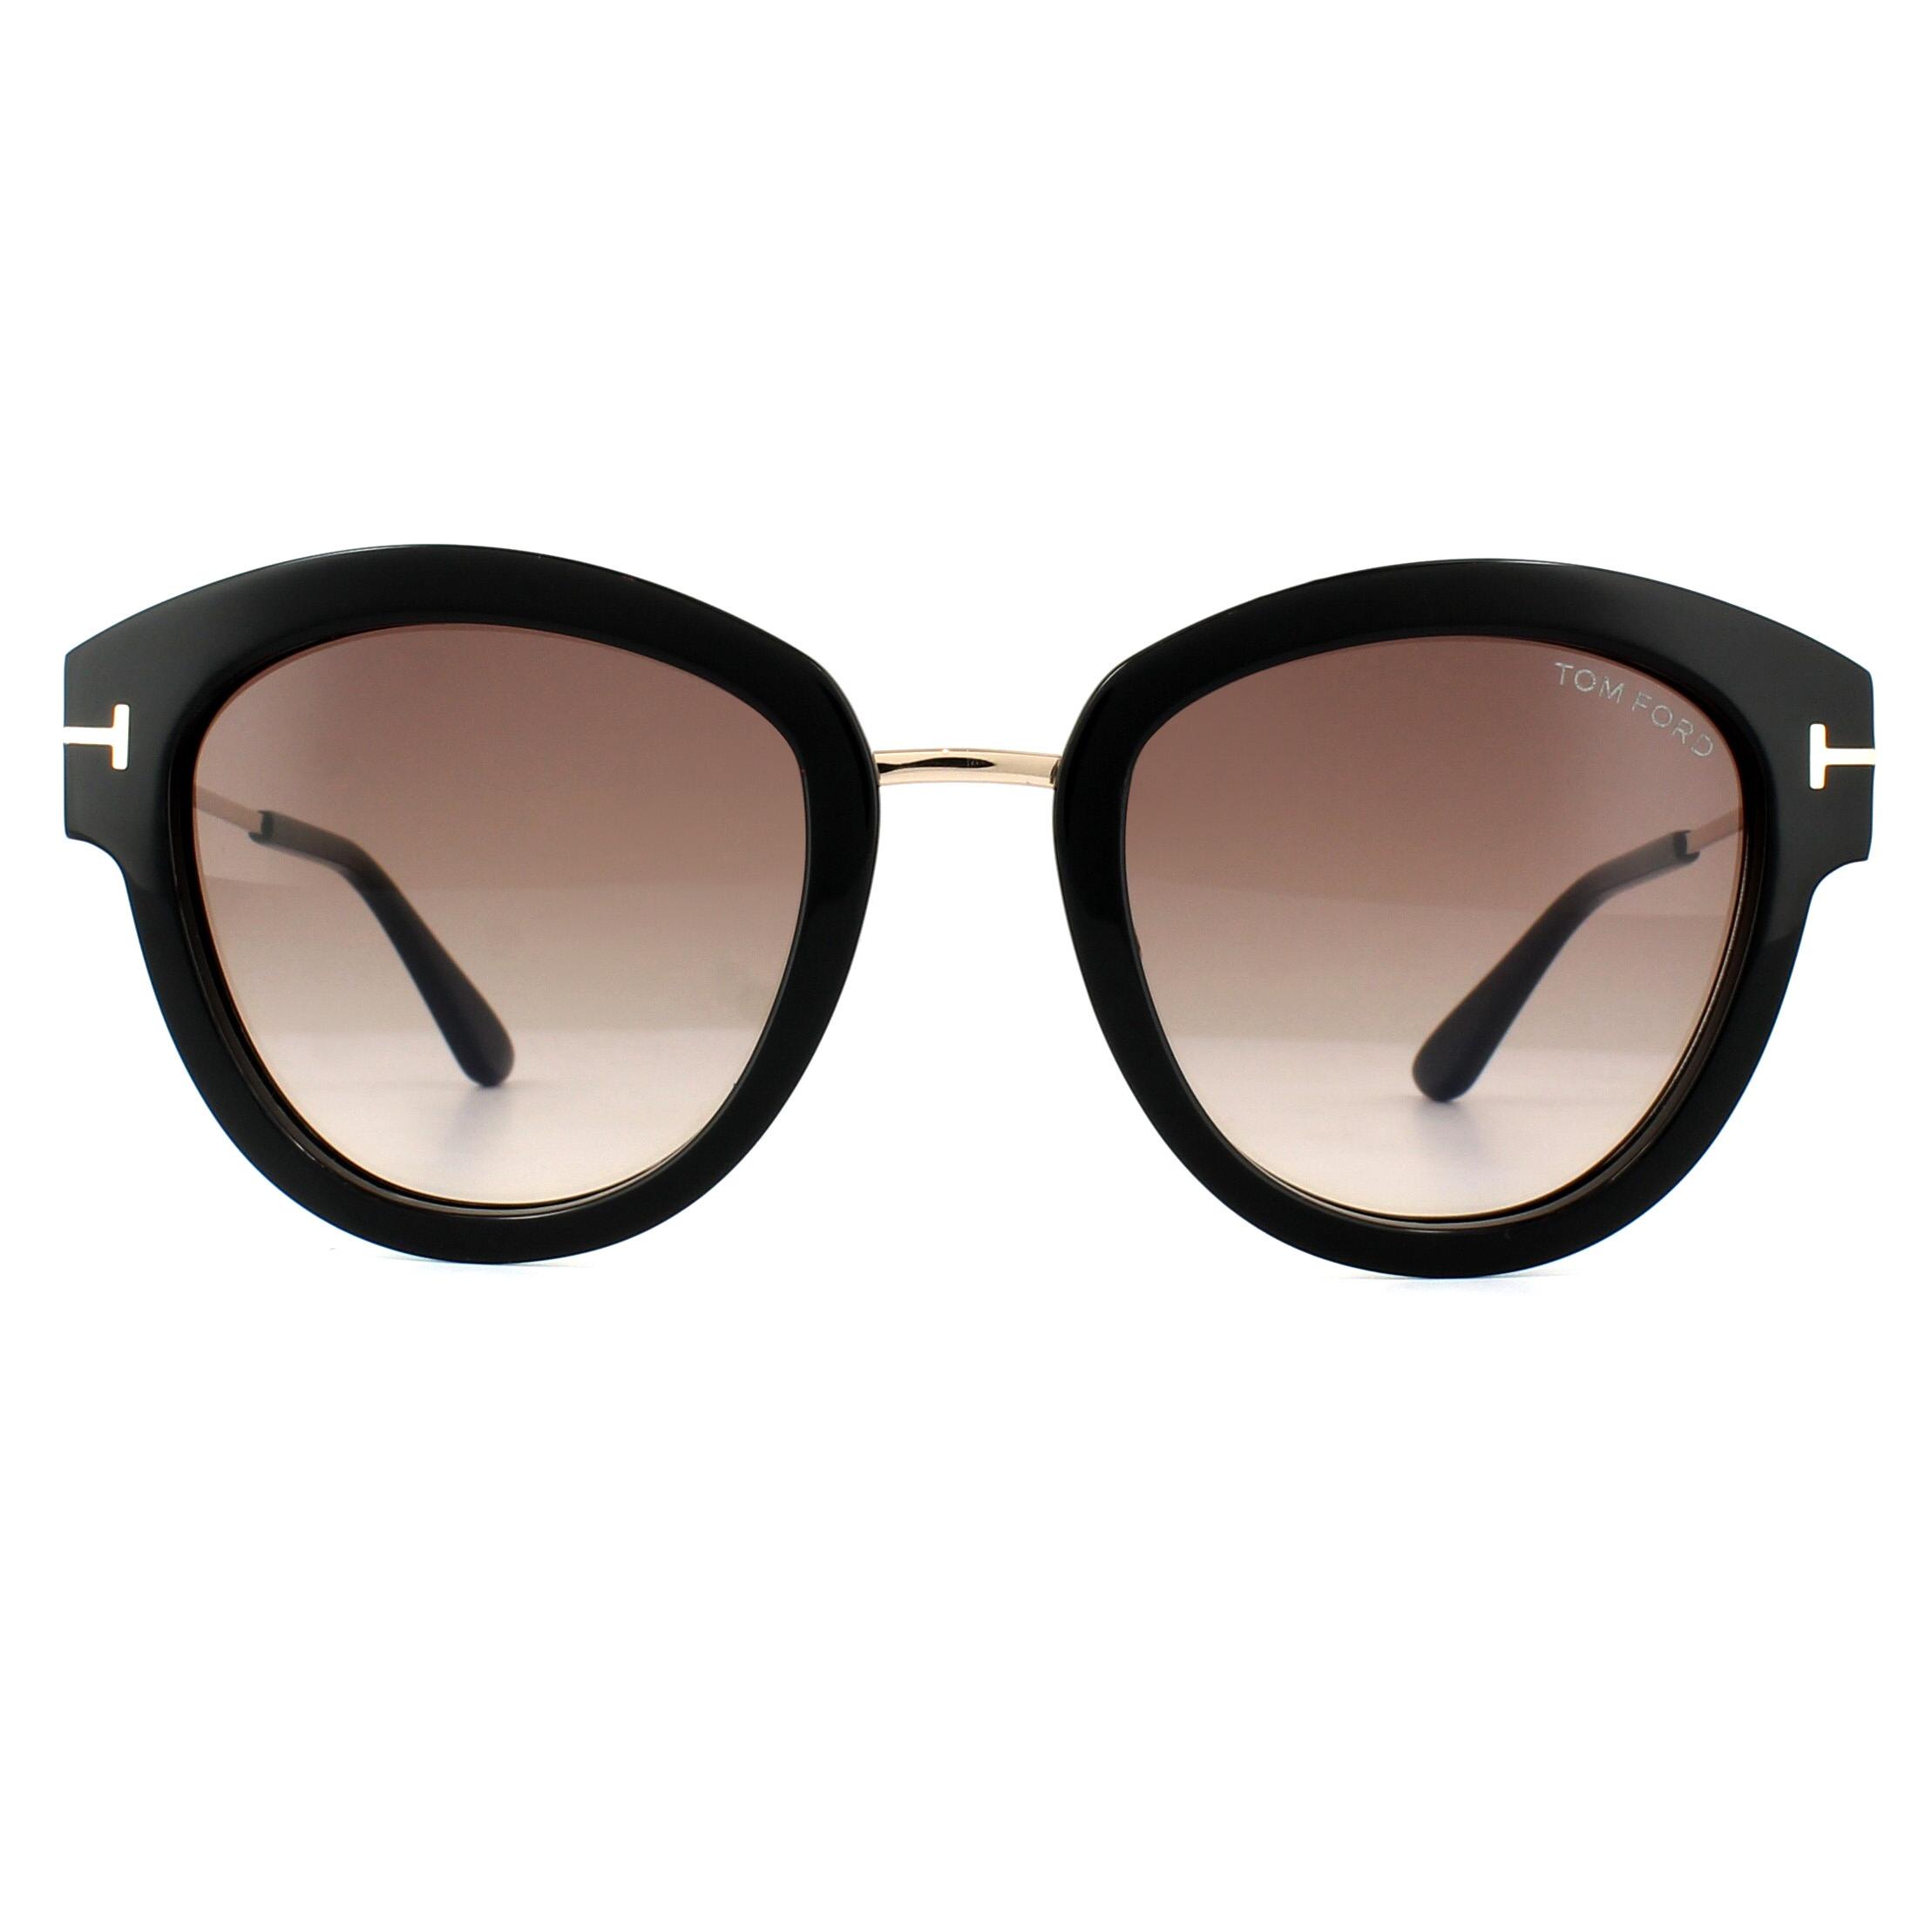 affbb697e36 Sentinel Tom Ford Sunglasses 0574 Mia 01T Shiny Black Bordeaux Gradient